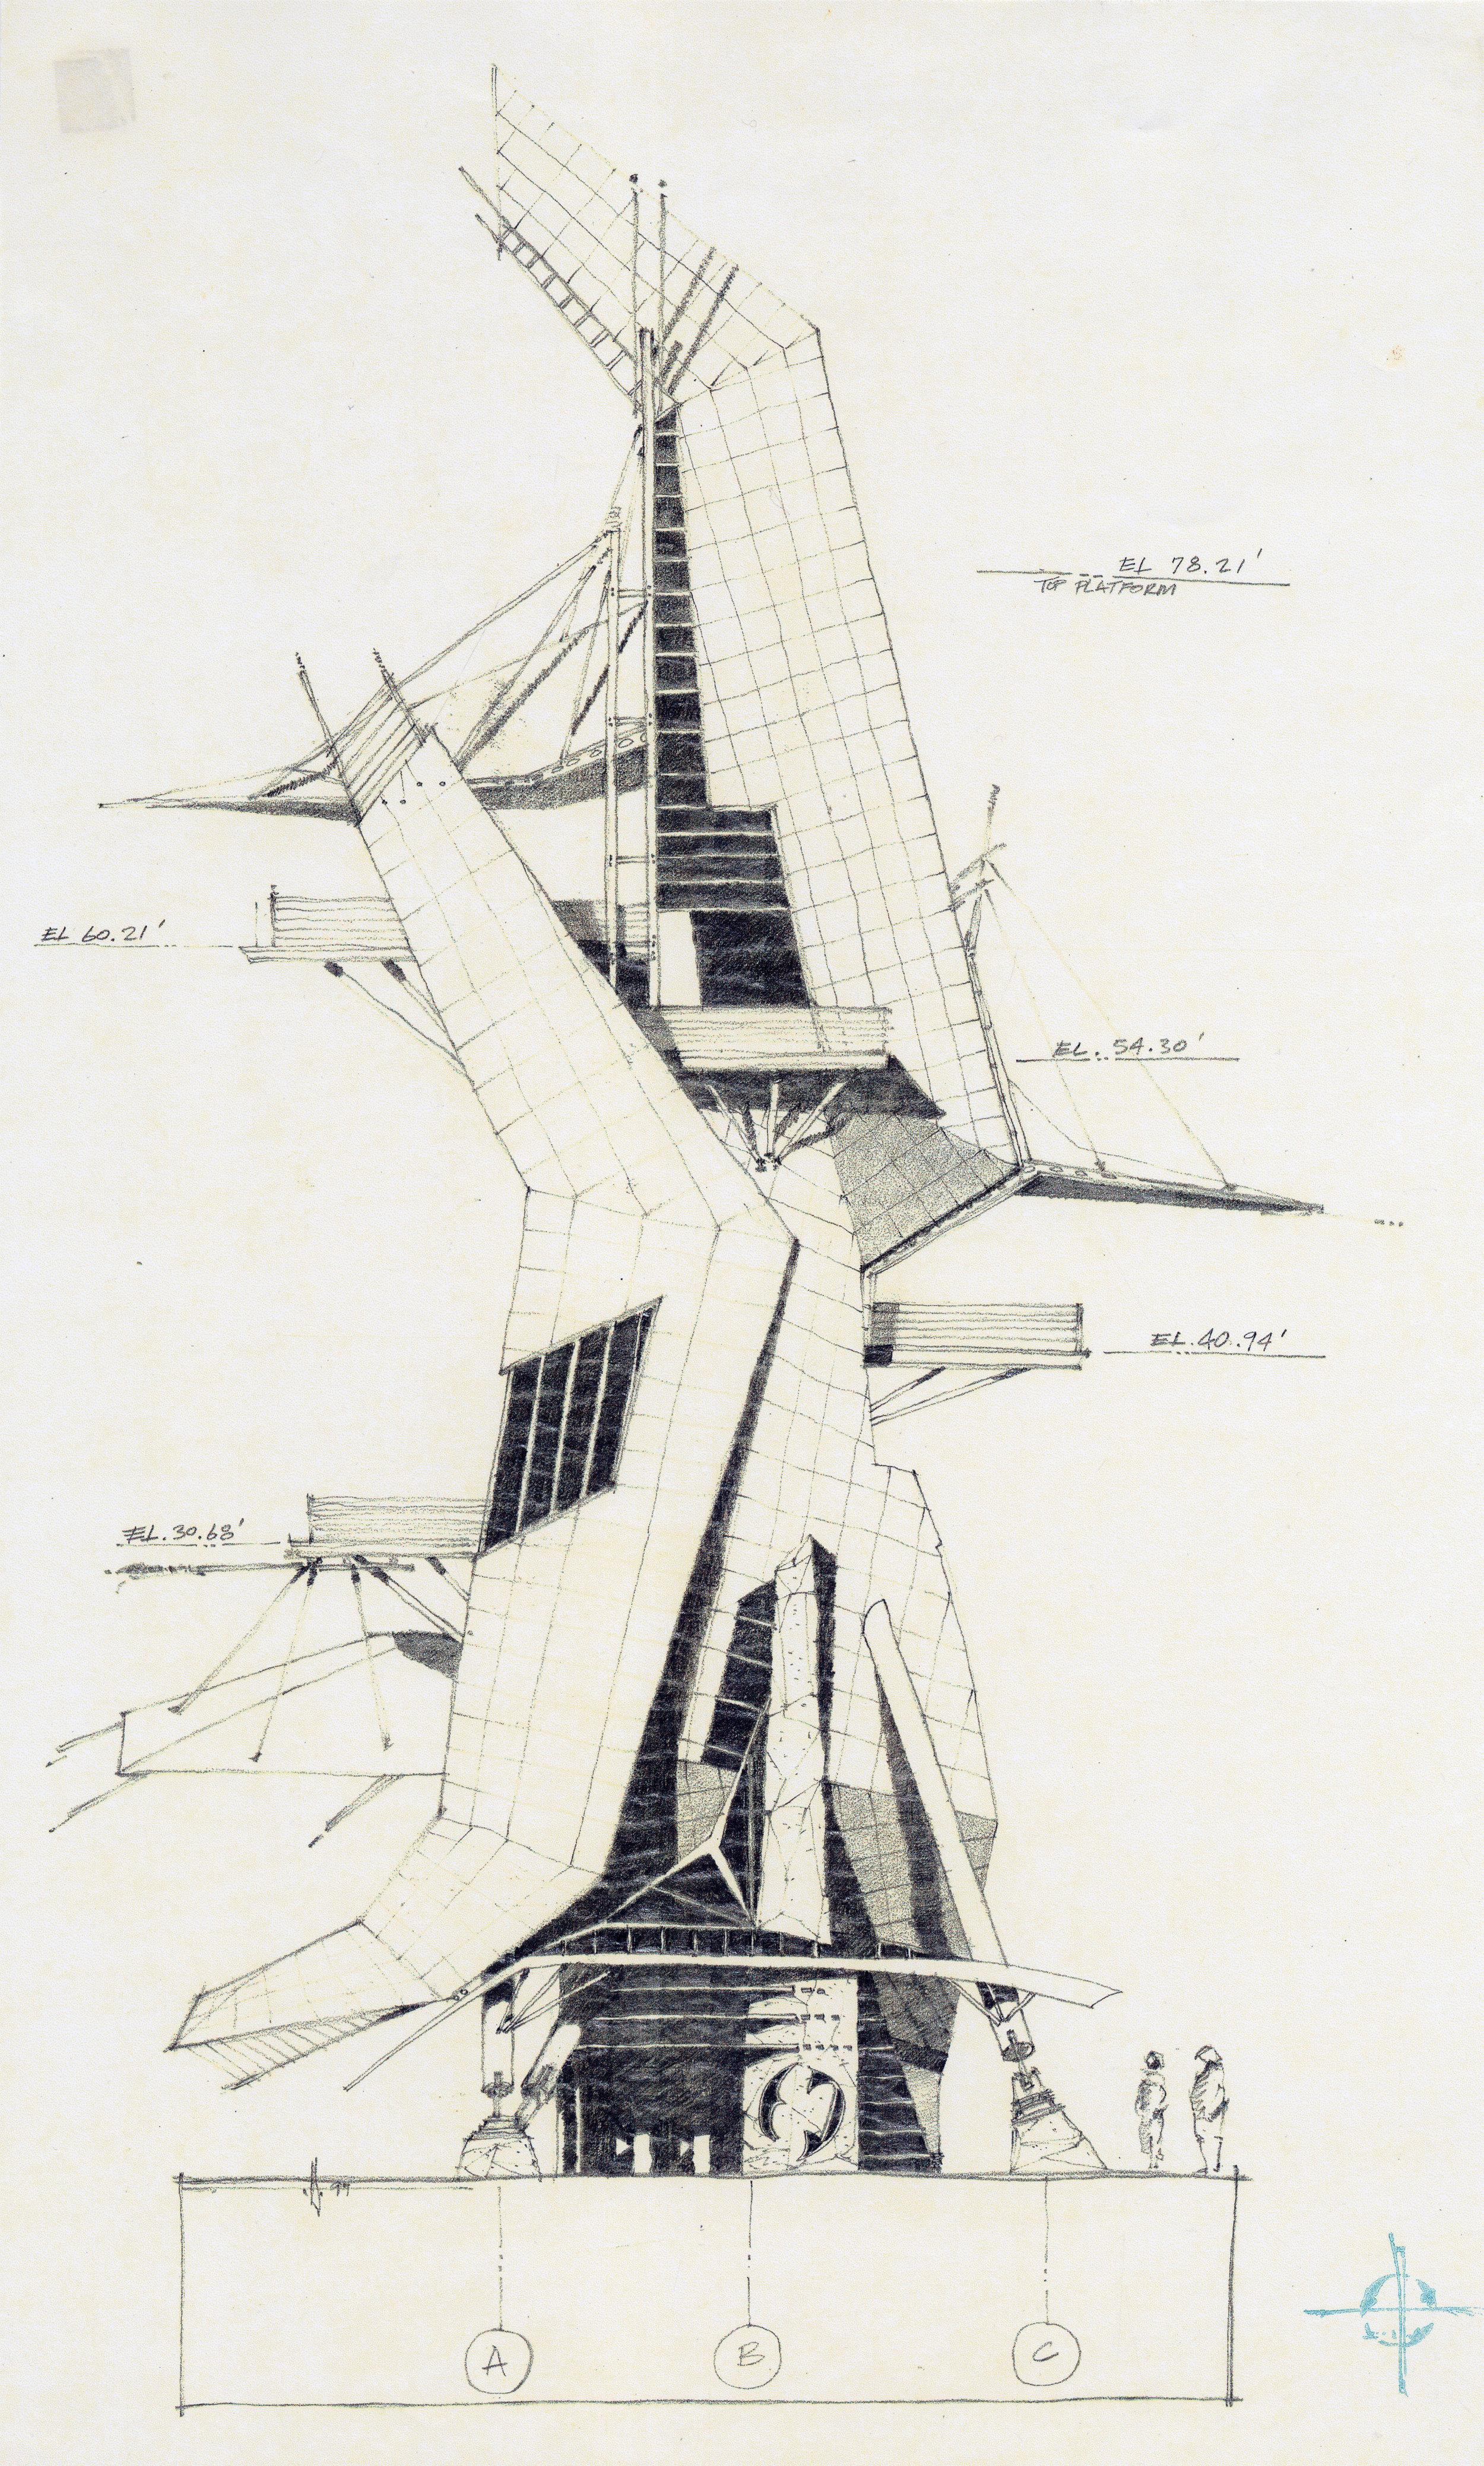 The Lantern - High speed water slide towers